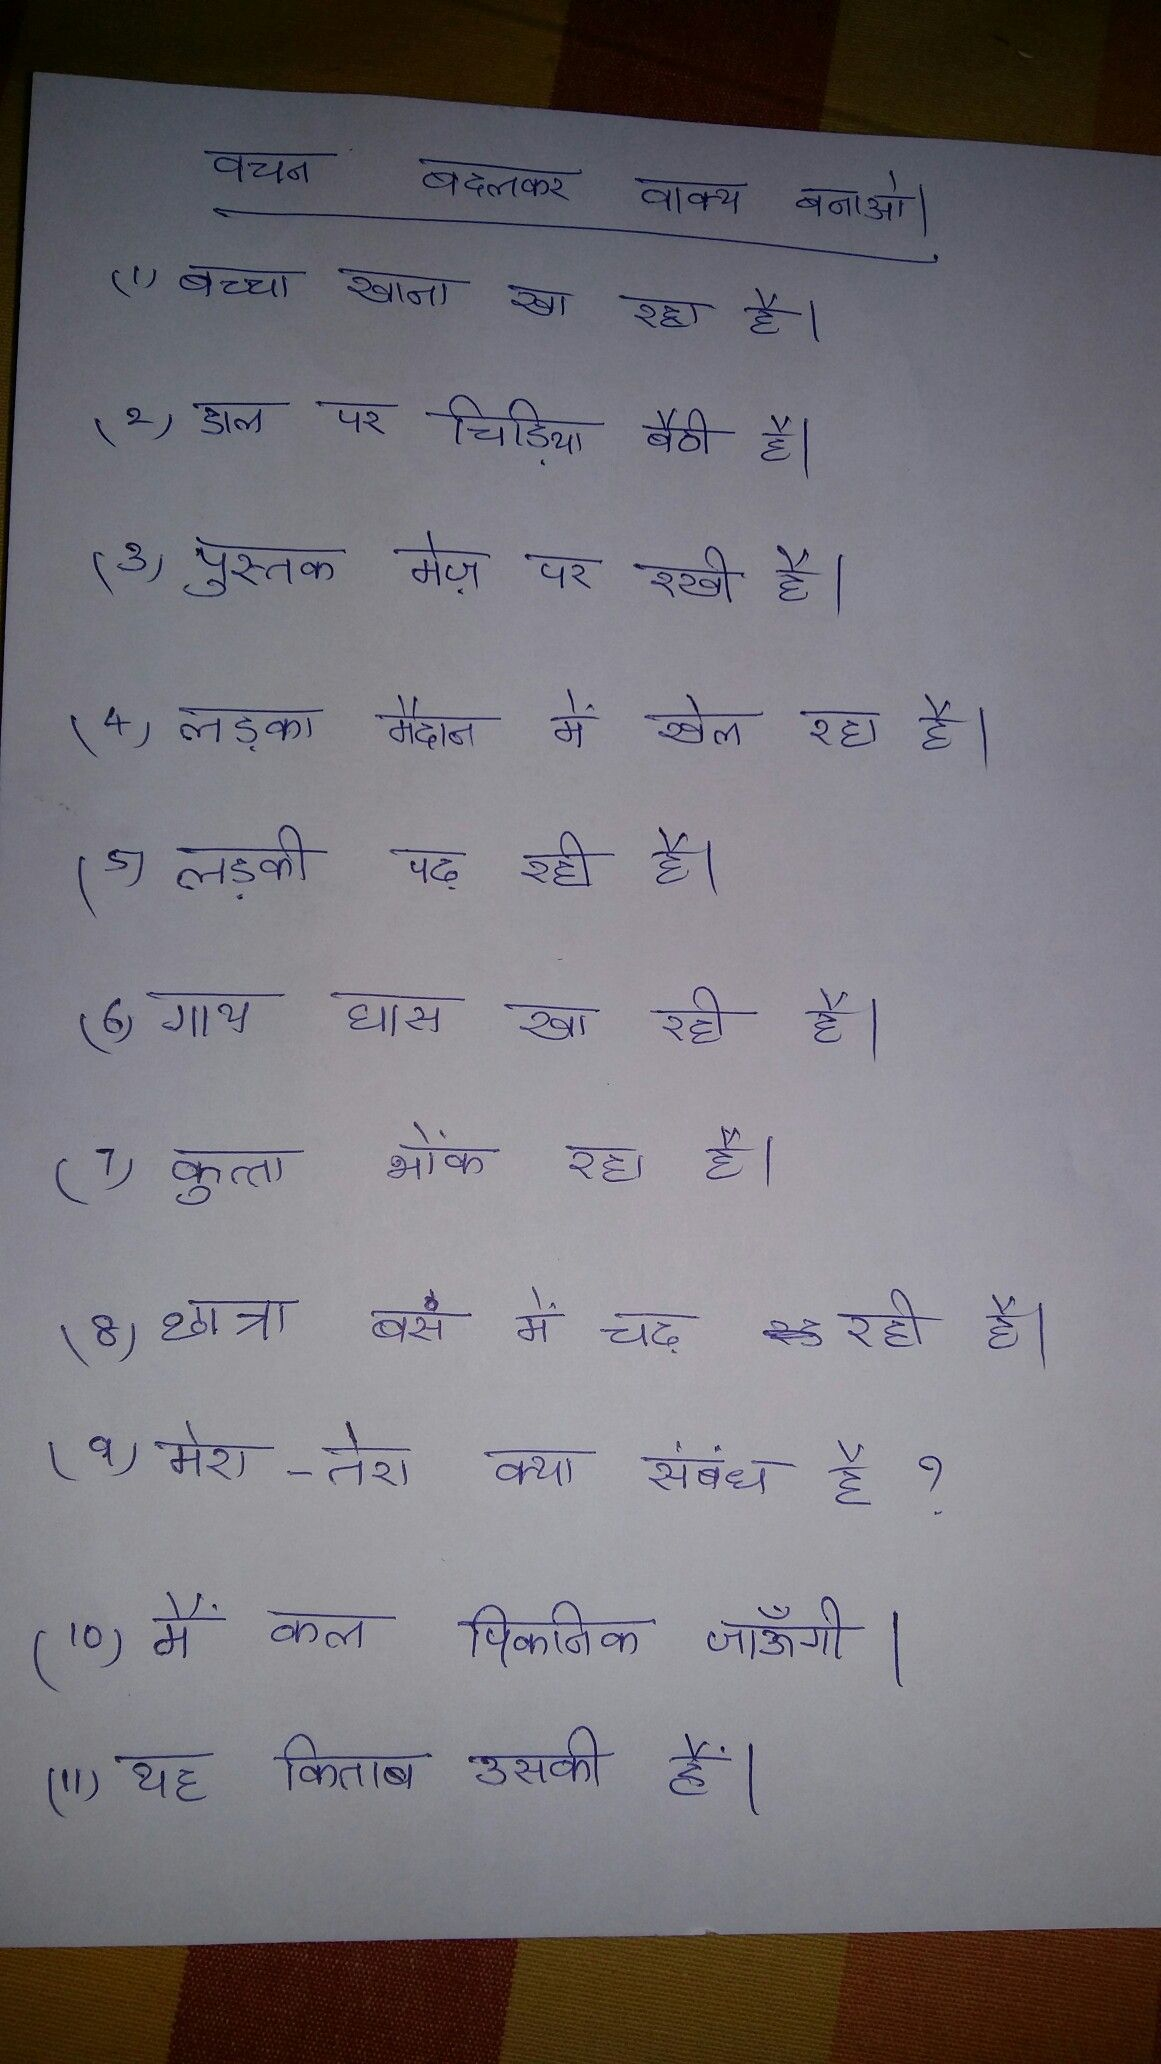 medium resolution of Hindi grammar vachan worksheet   Hindi worksheets